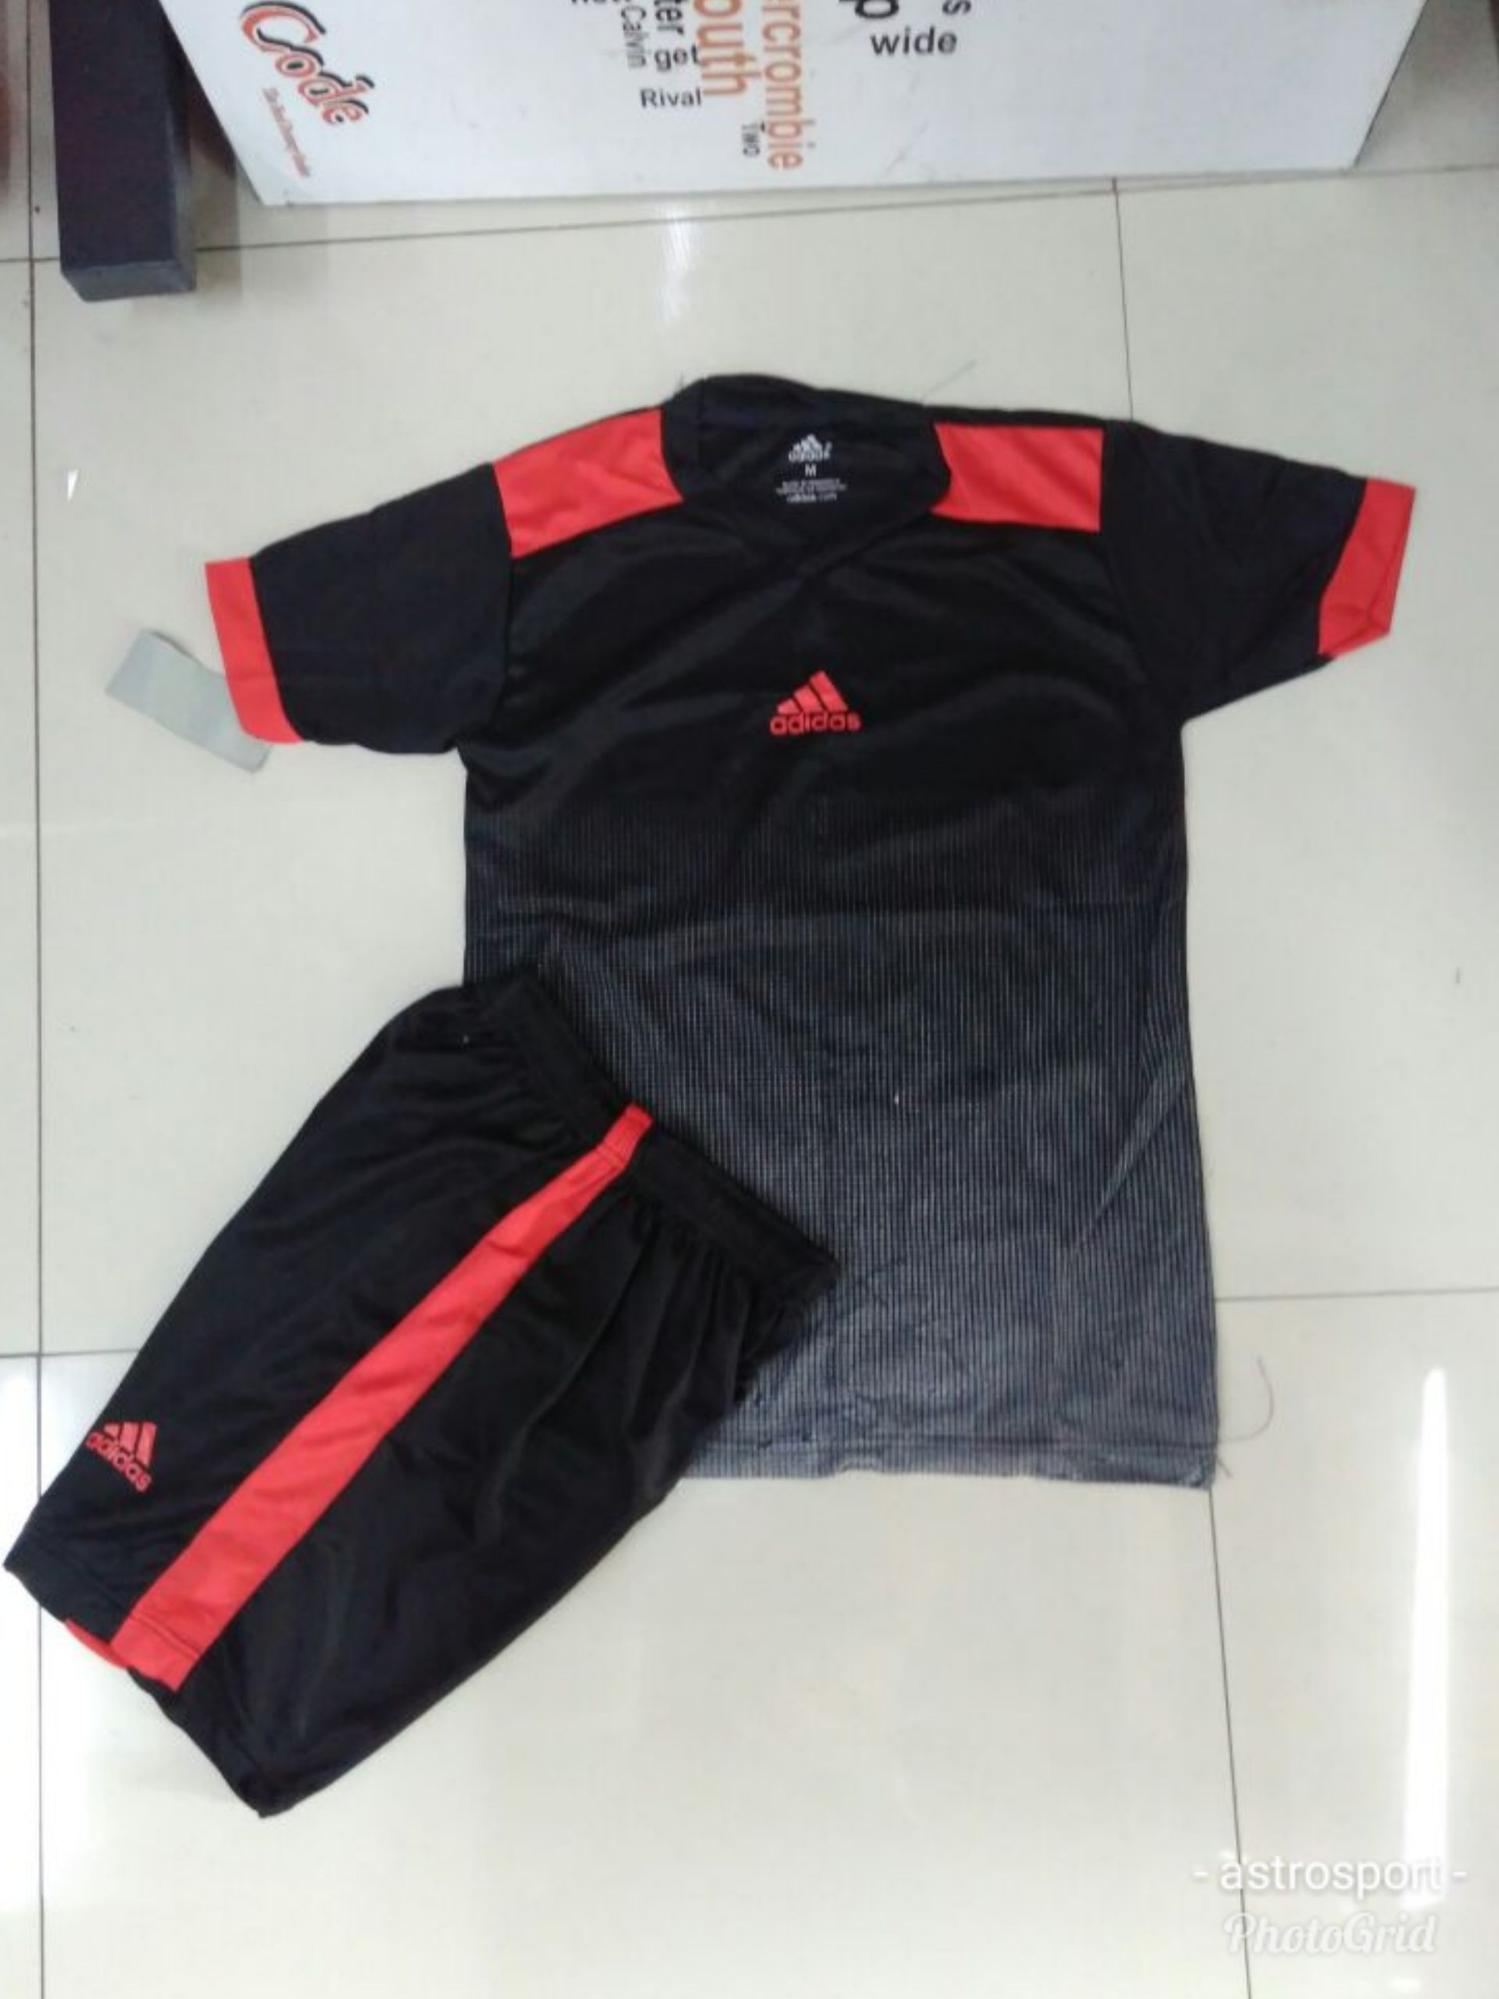 Fitur Promo Setelan Futsal Sepakbola Adidas Ad02 Baju Kaos Celana Tshirt 03 Anak Dan Spec